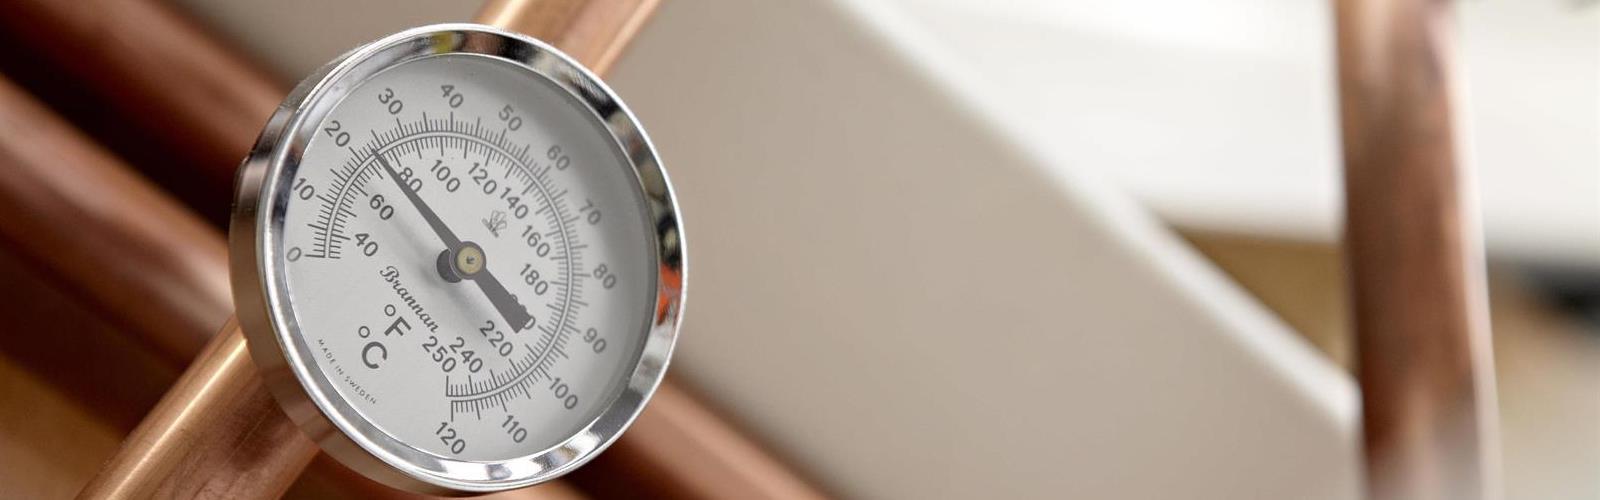 Centrale verwarming cv ketel onderhoud Loodgieter Spoor Hoofddorp